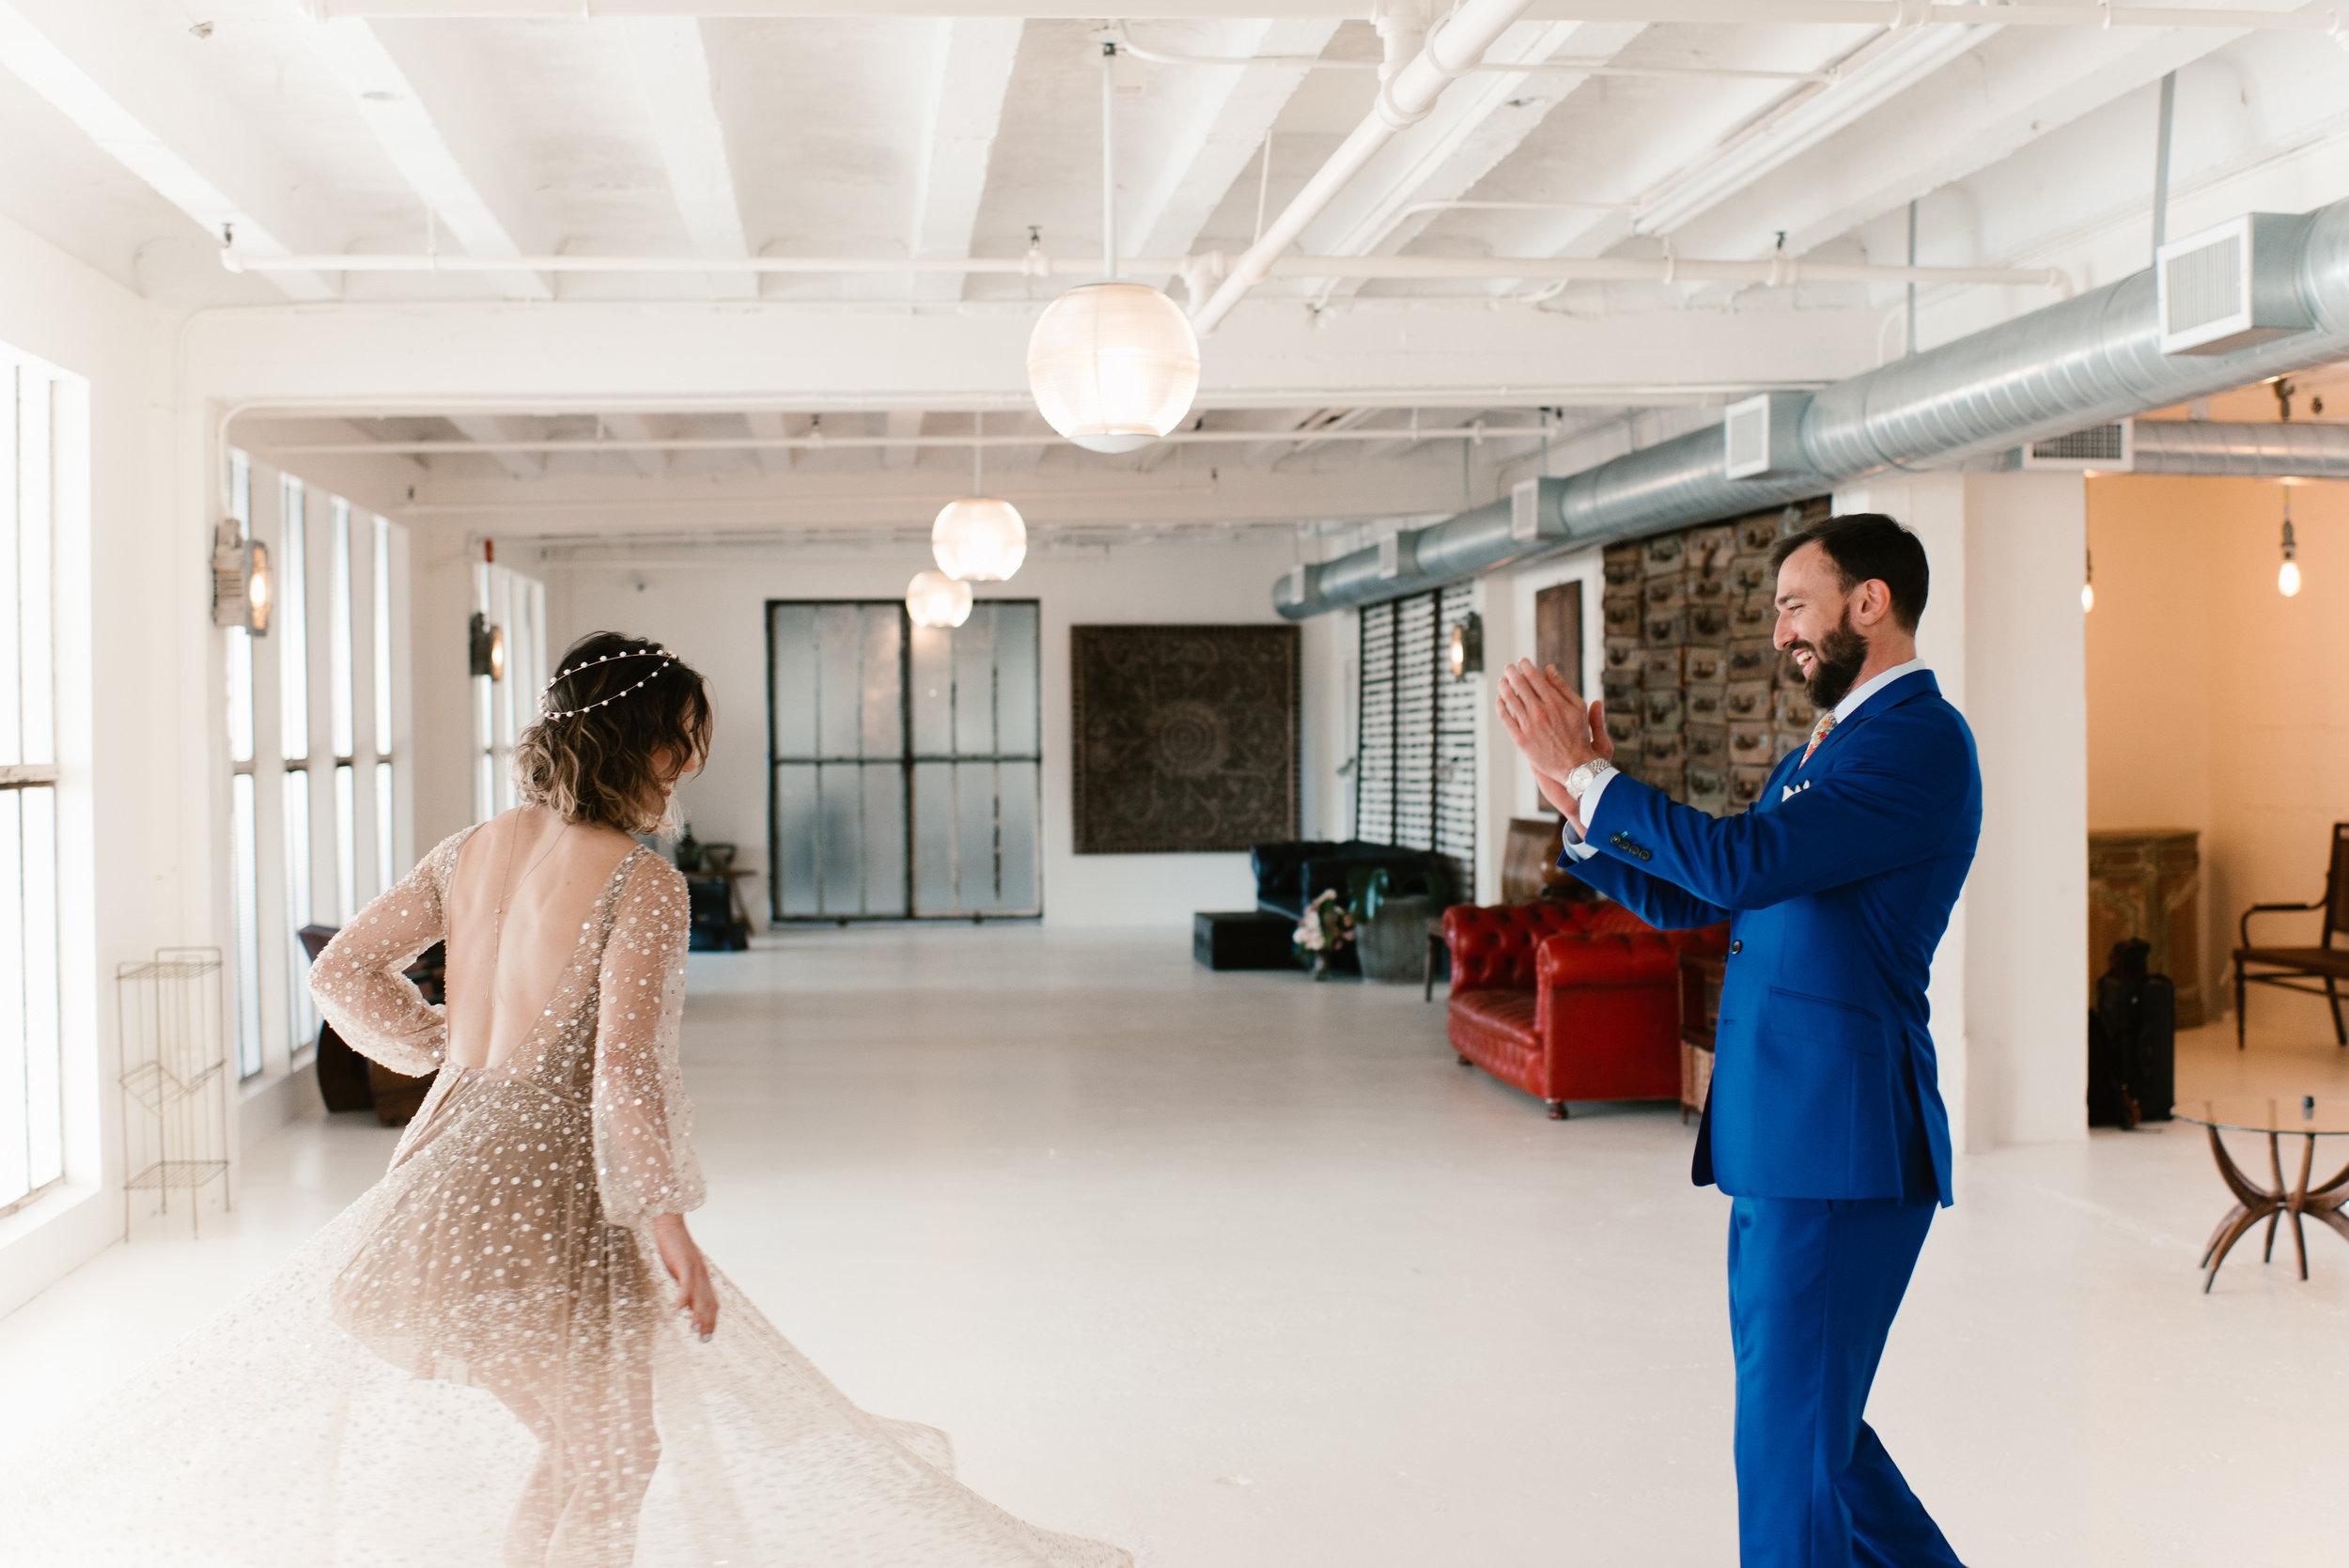 stephanie-bobby-ace-prop-house-miami-florida-wedding-418.jpg